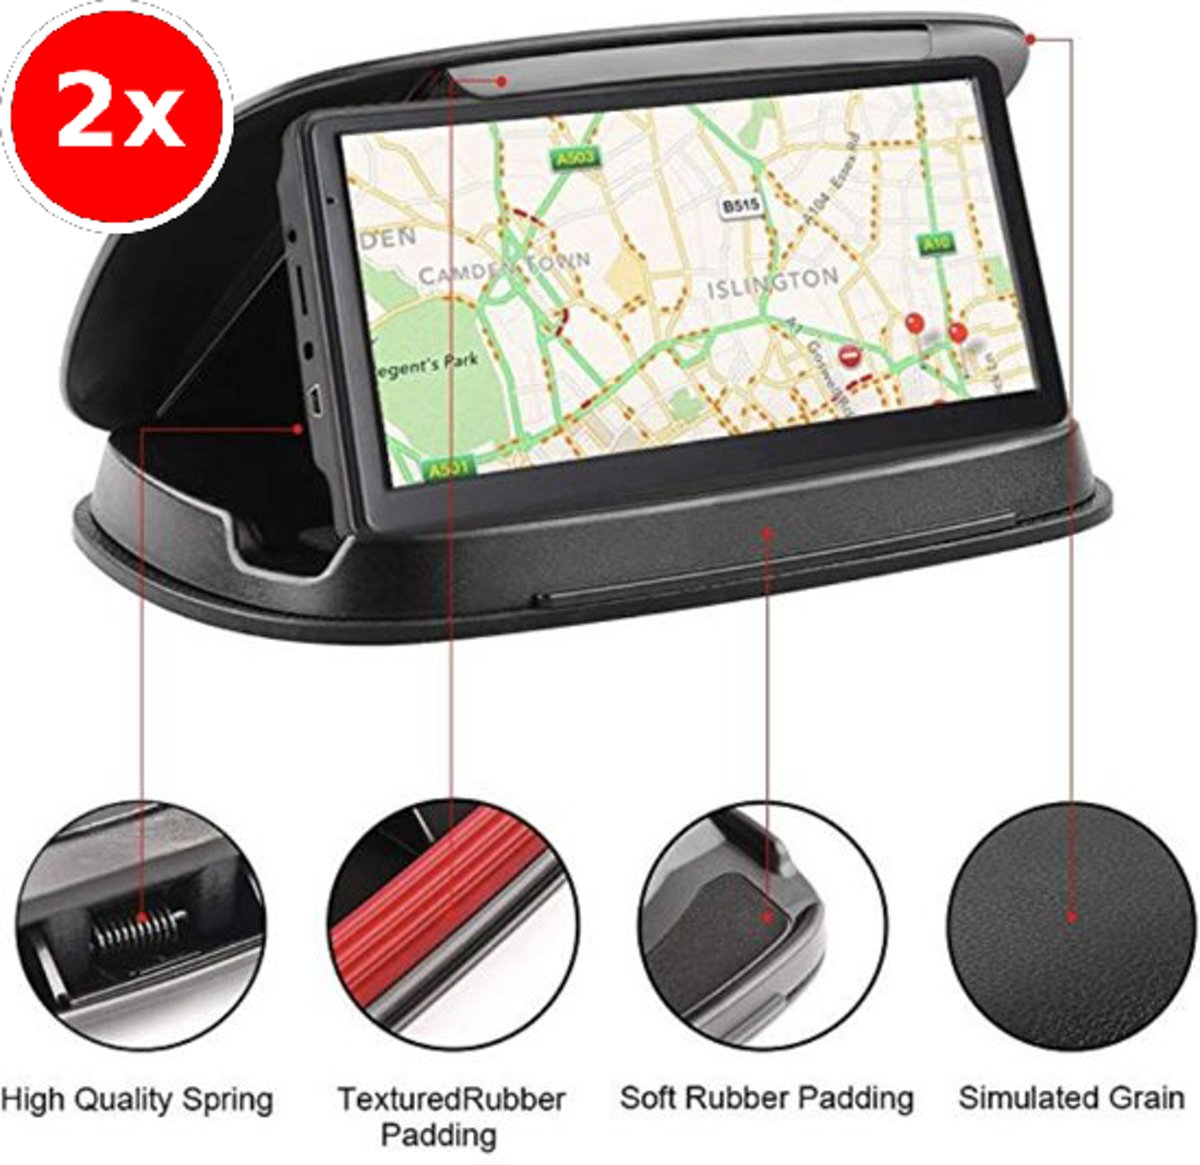 2x Nieuw Luxe Auto telefoon houder - Dashboard houder , dashboard bevestiging , anti slip Beanbag - autohouder ultra luxe voor Garmin Nuvi TomTom iPhone Samsung - Rheme kopen